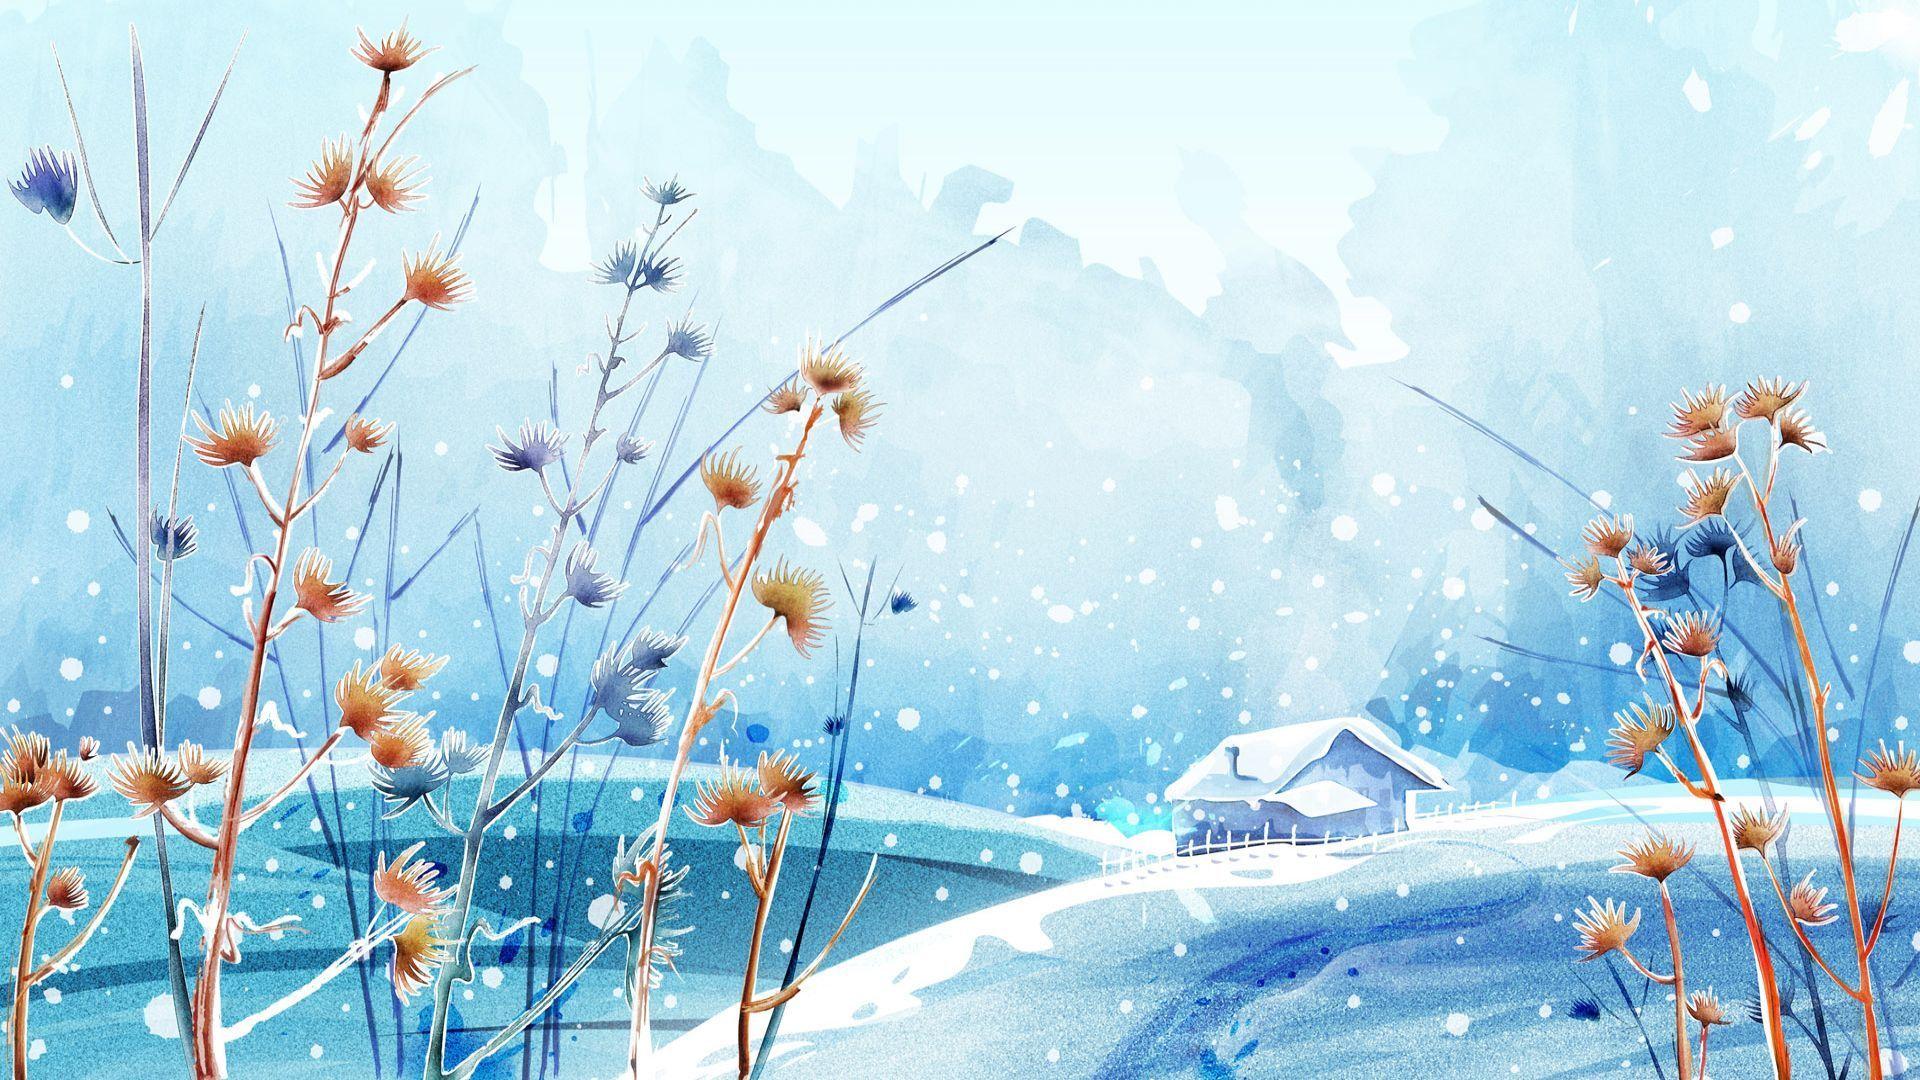 Anime Winter Scenery Wallpaper Hd Wallpapers Backgrounds Of Your Choice Winter Wallpaper Scenery Wallpaper Landscape Wallpaper